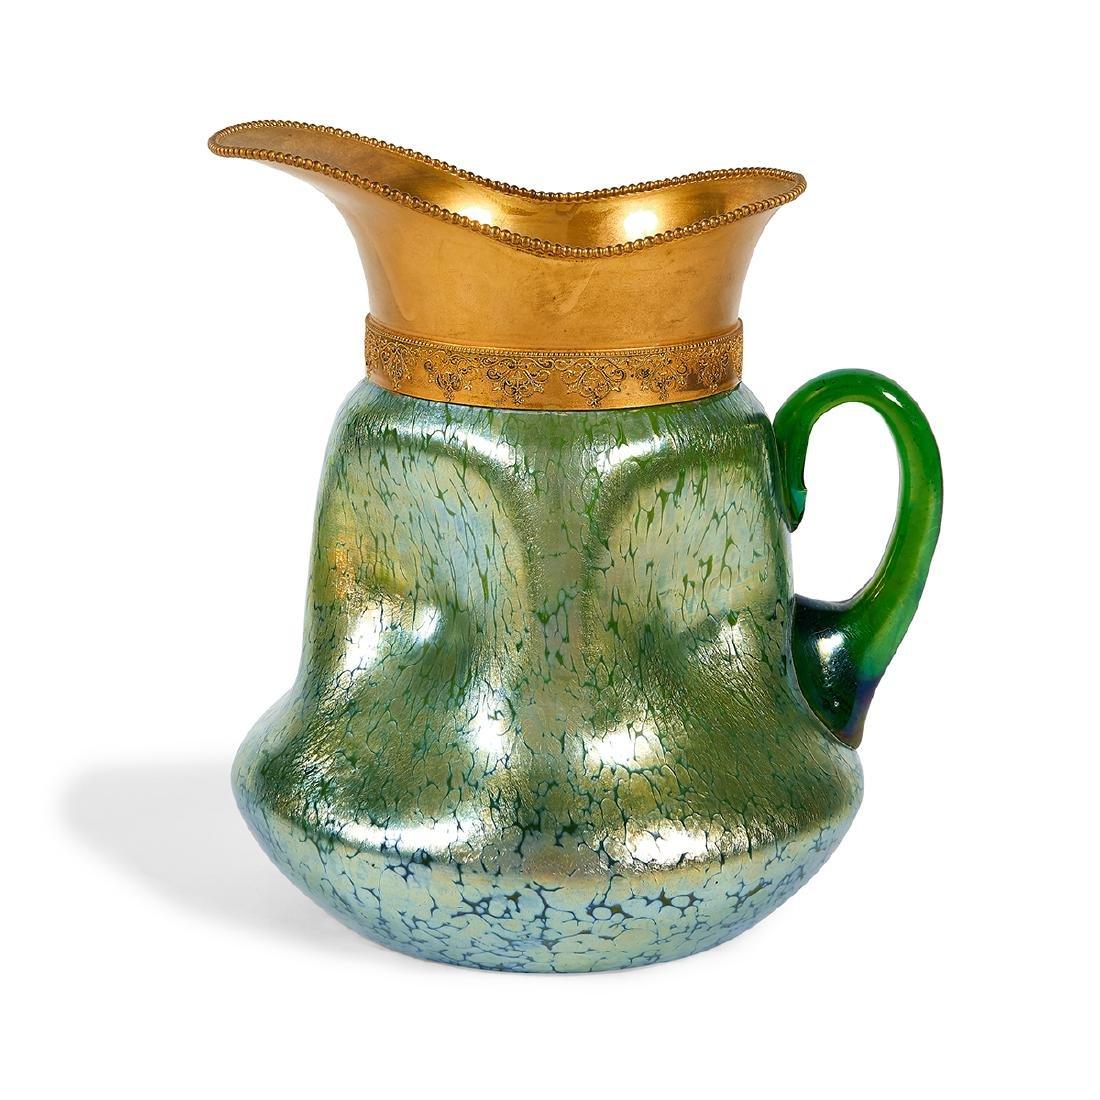 Loetz, Pappilon Creta Glass & Gilt Metal Pitcher